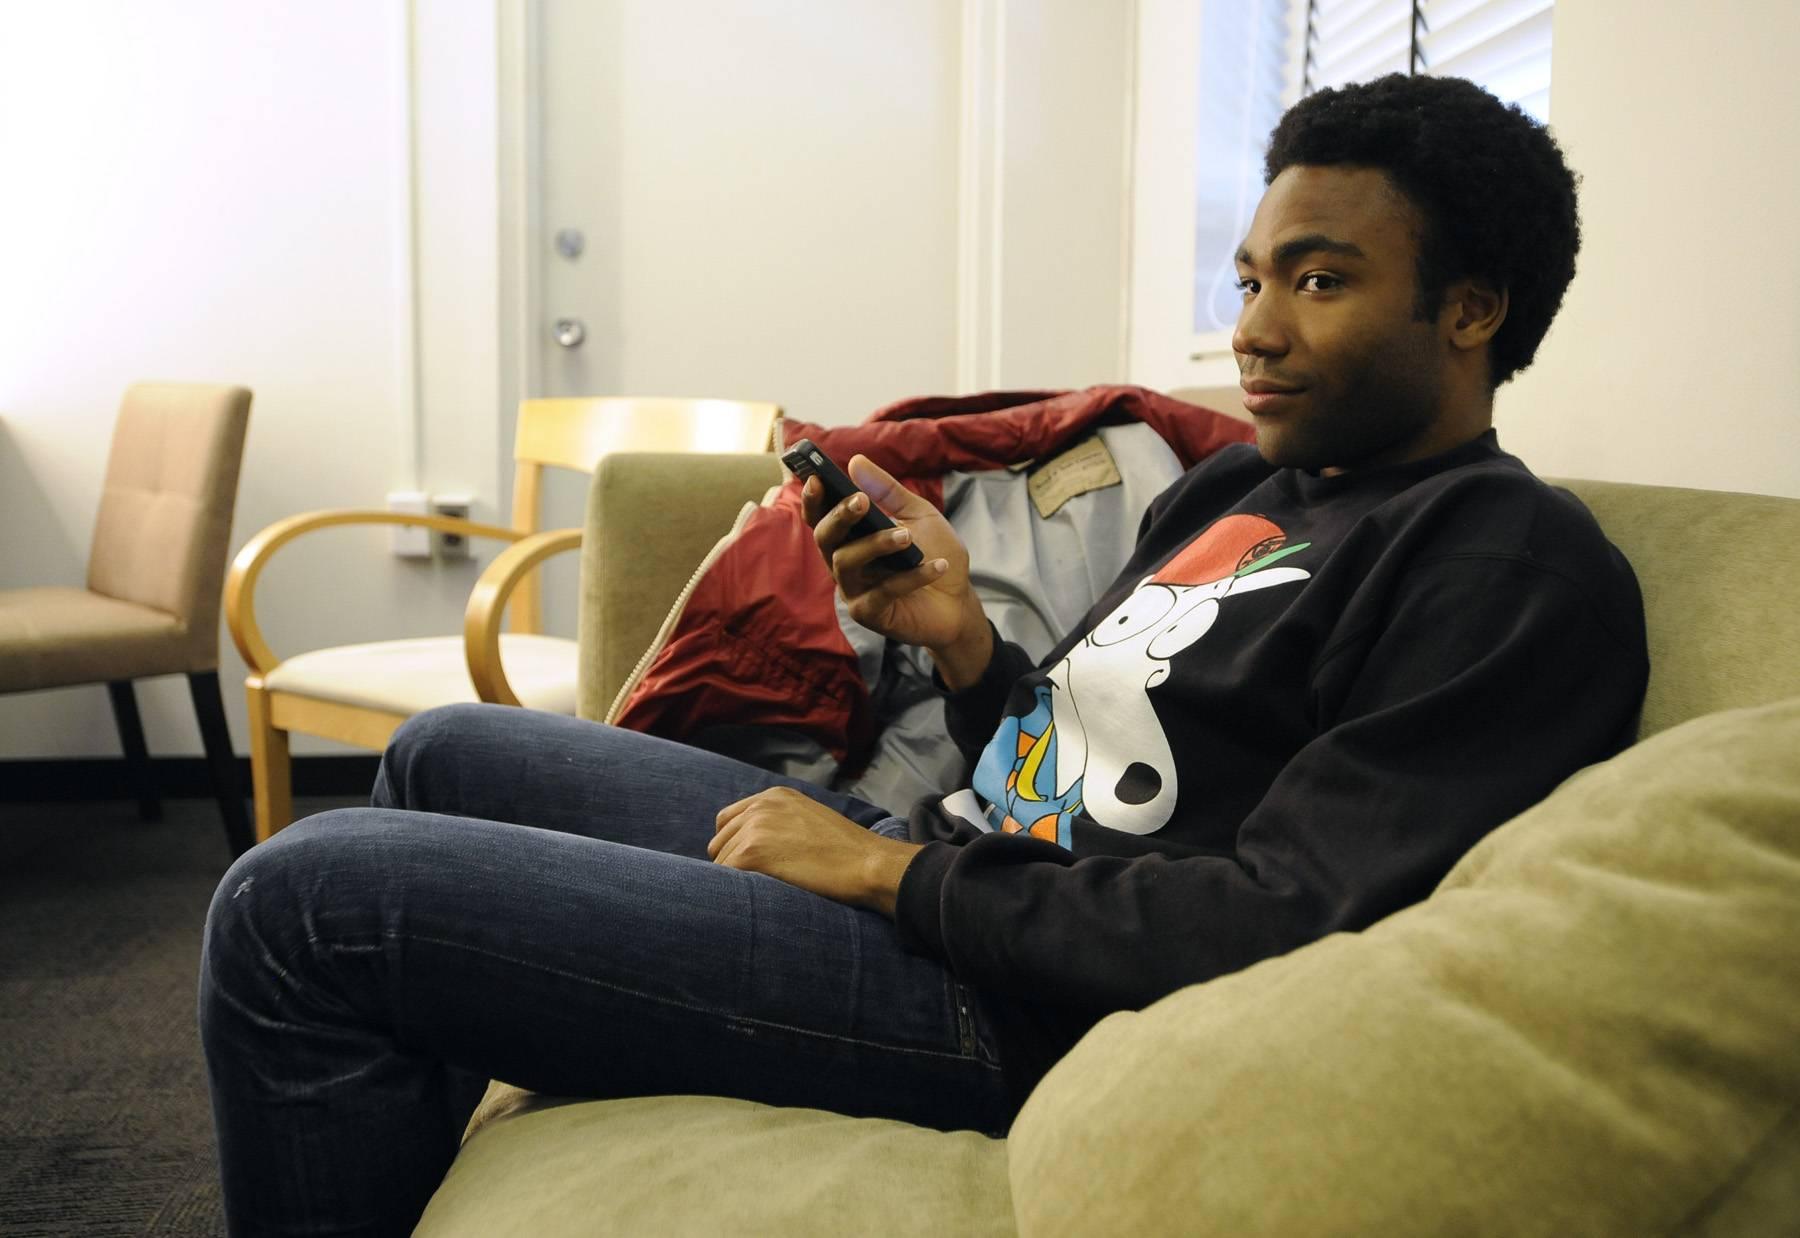 Ready - Childish Gambino in the green room at 106 & Park, May 1, 2012. (Photo: John Ricard / BET)